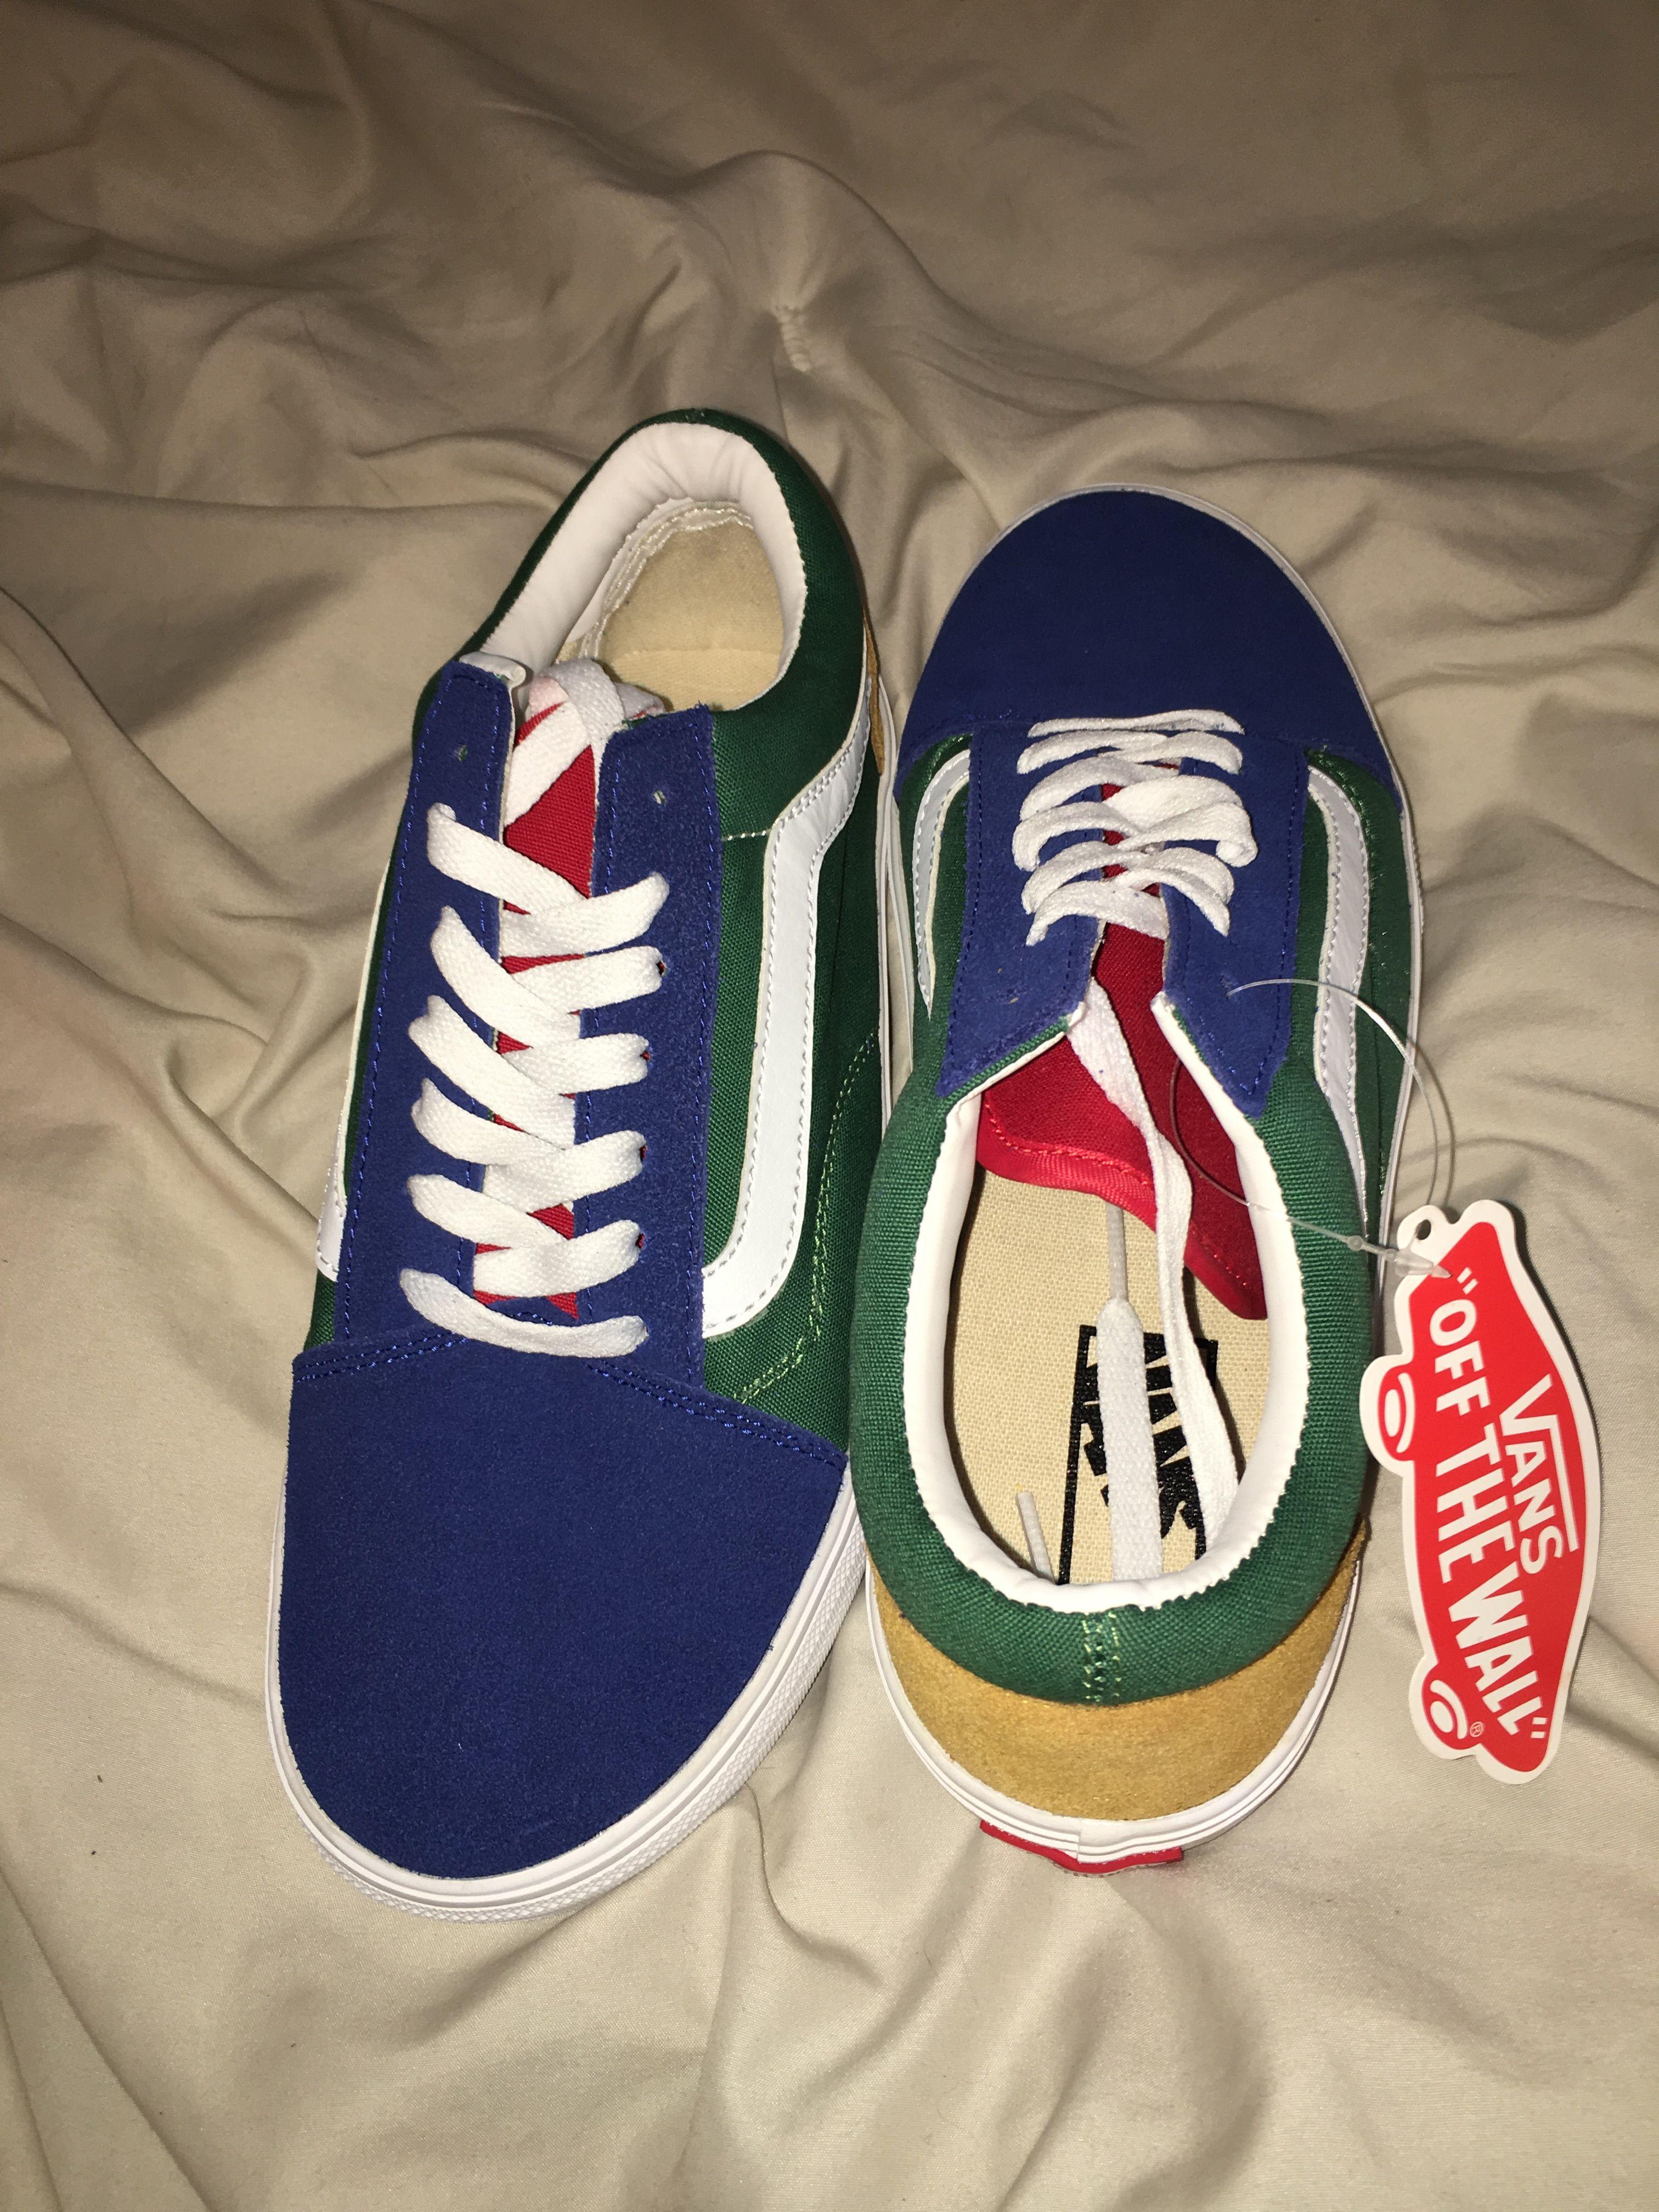 Vans Old Skool Yacht Club | Vans, Stylish shoes, Skate shoes